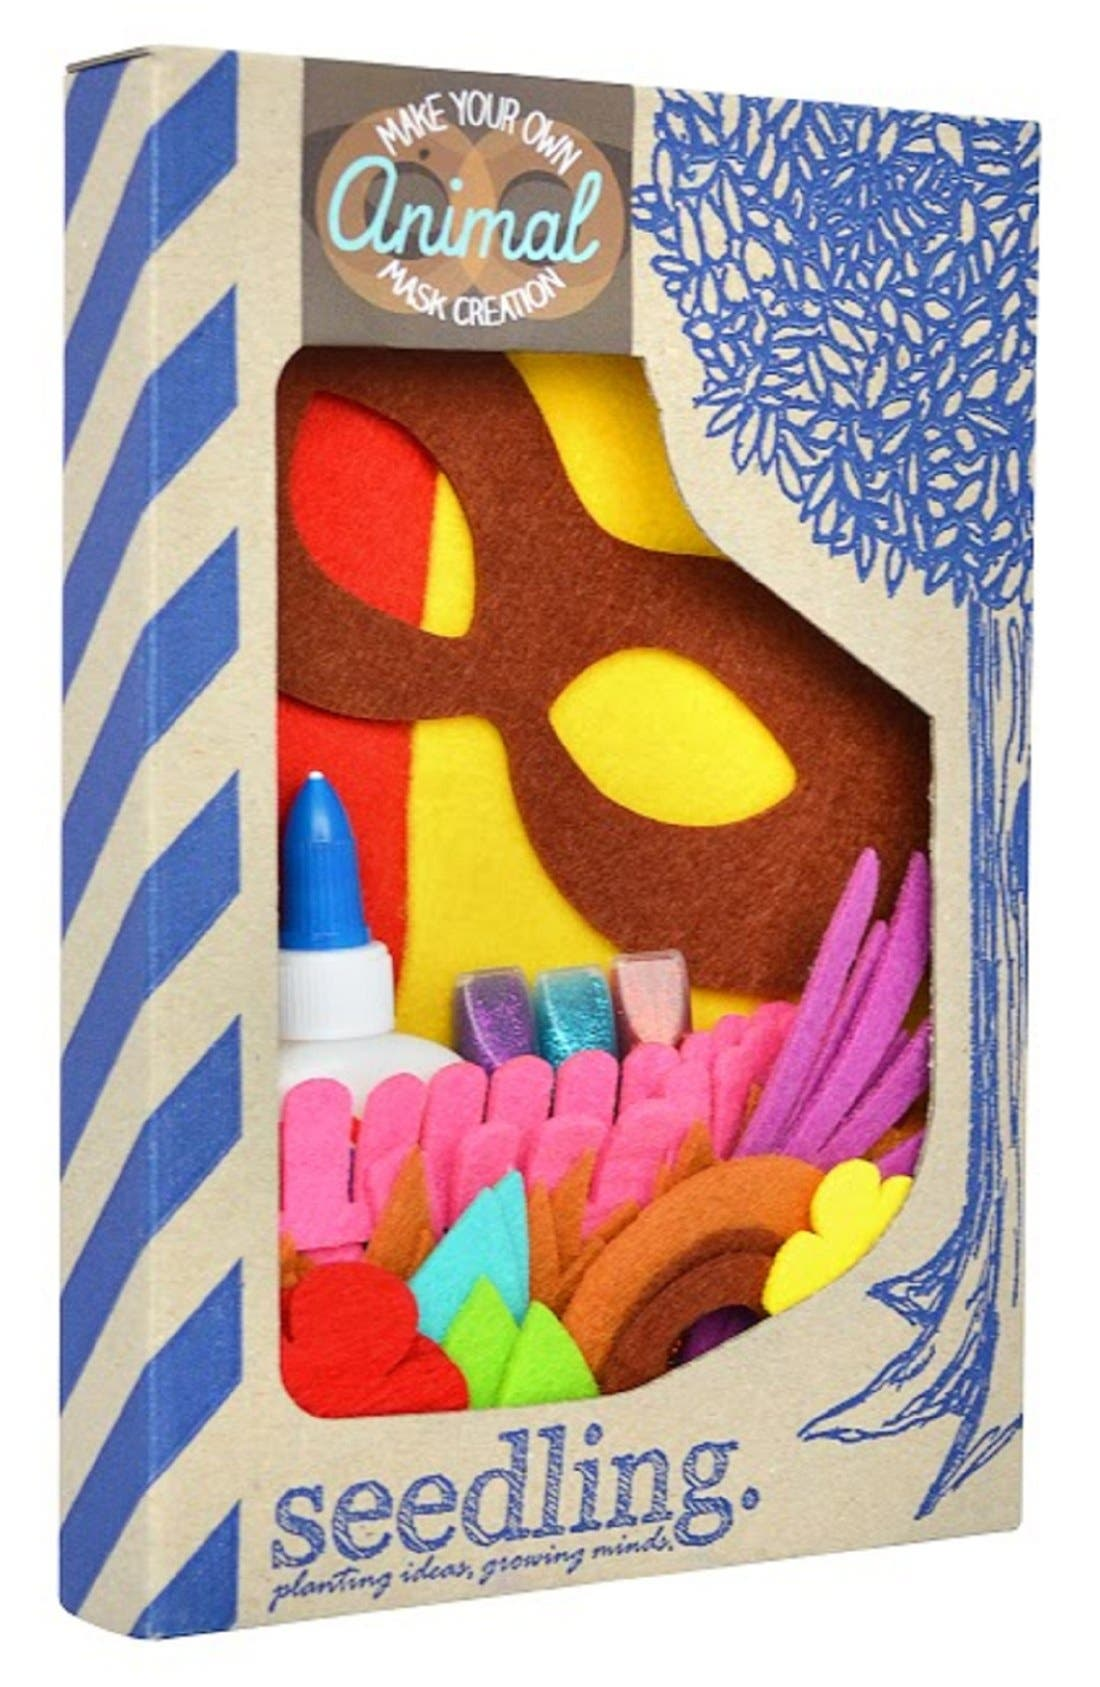 'Make Your Own Animal Mask Creation' DIY Craft Kit,                             Main thumbnail 1, color,                             960